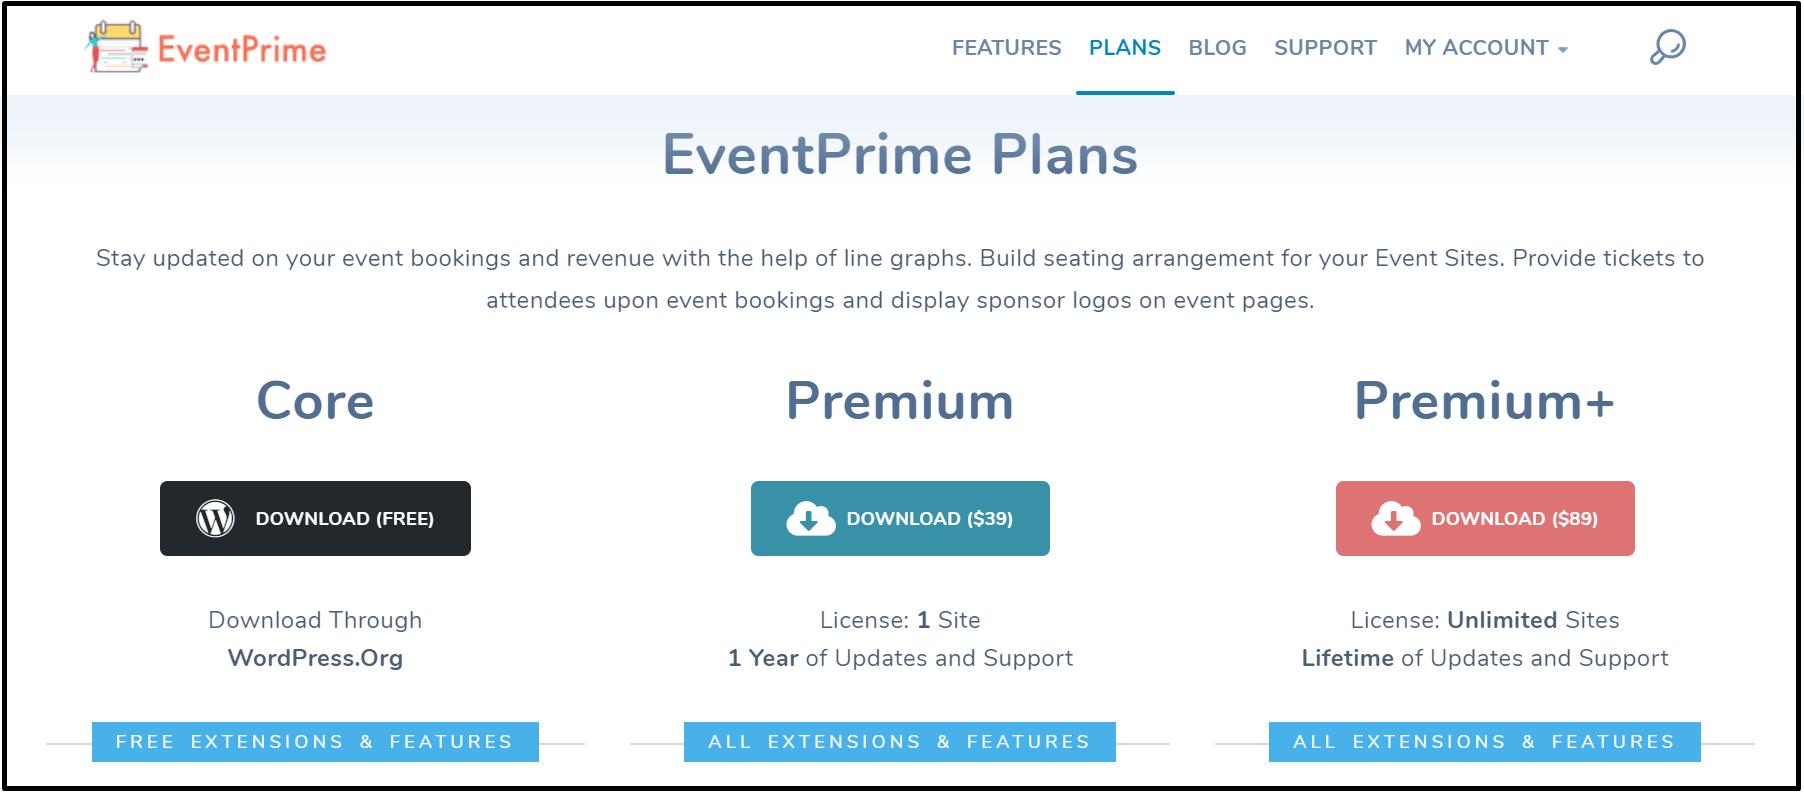 EventPrime Plans